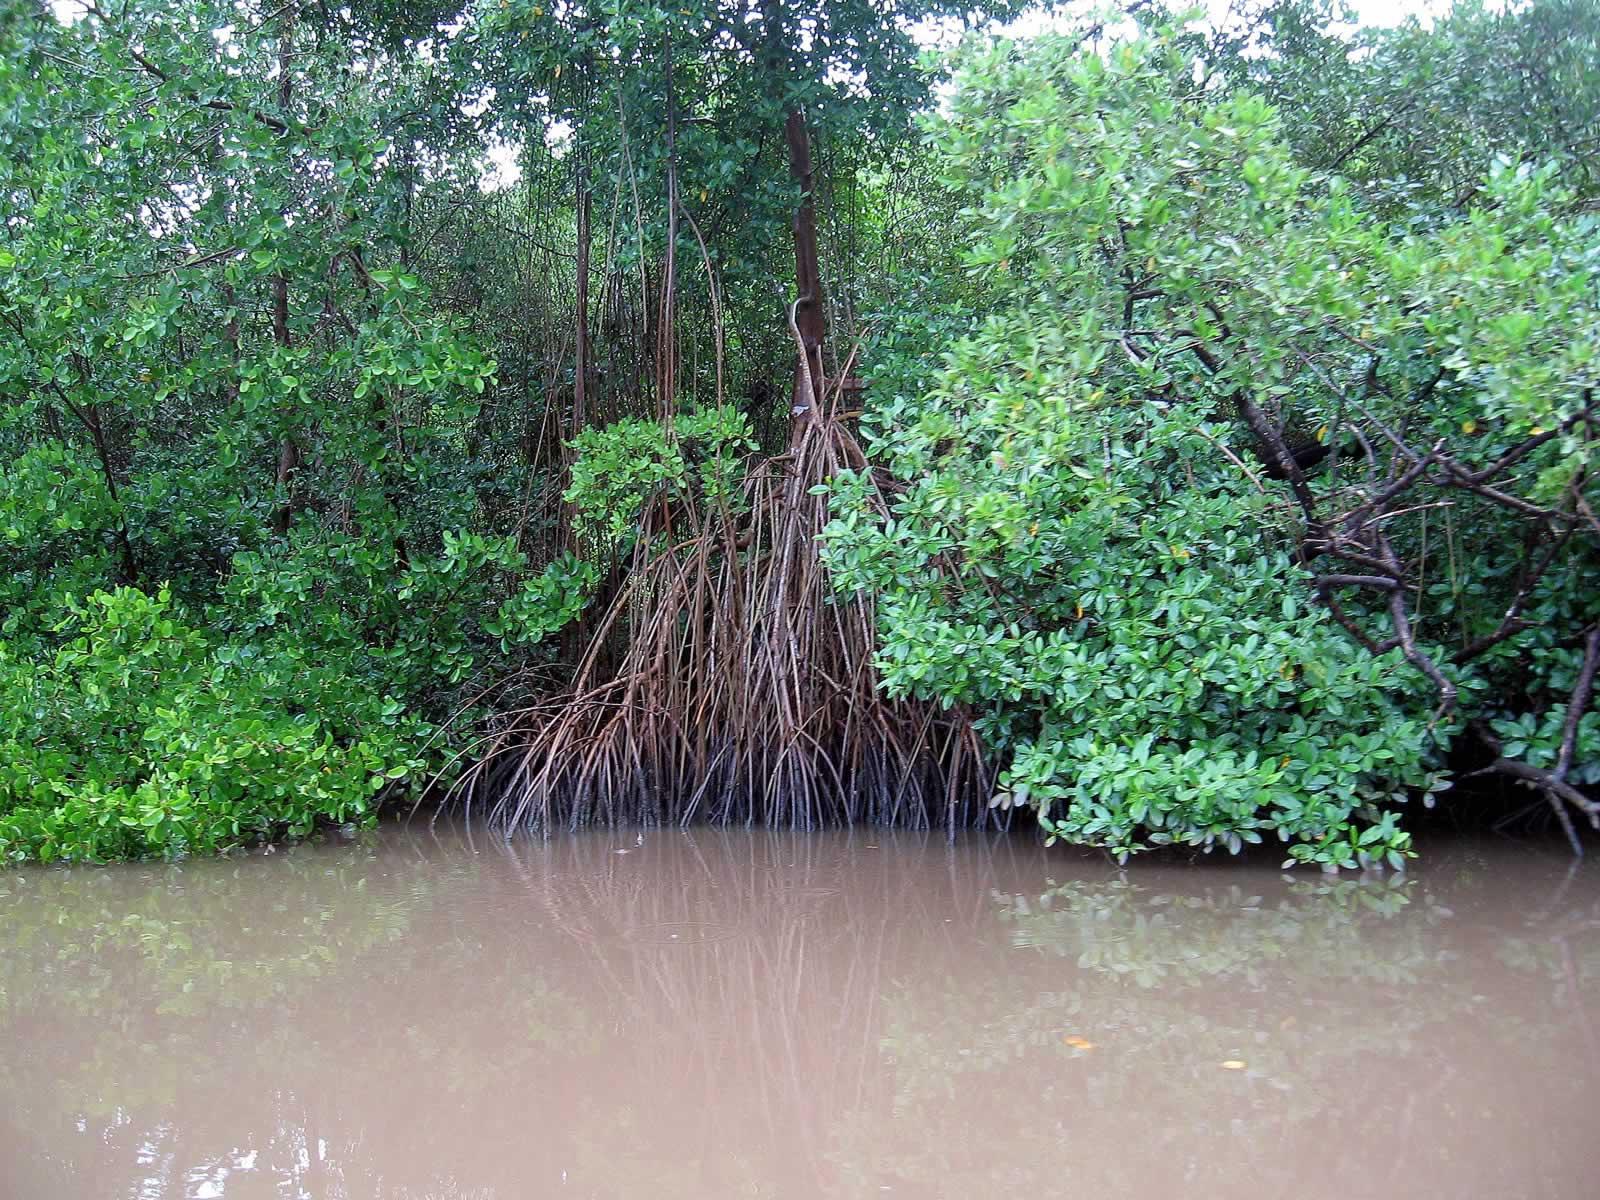 Caroni Swamp And Bird Sanctuary Destination Trinidad And